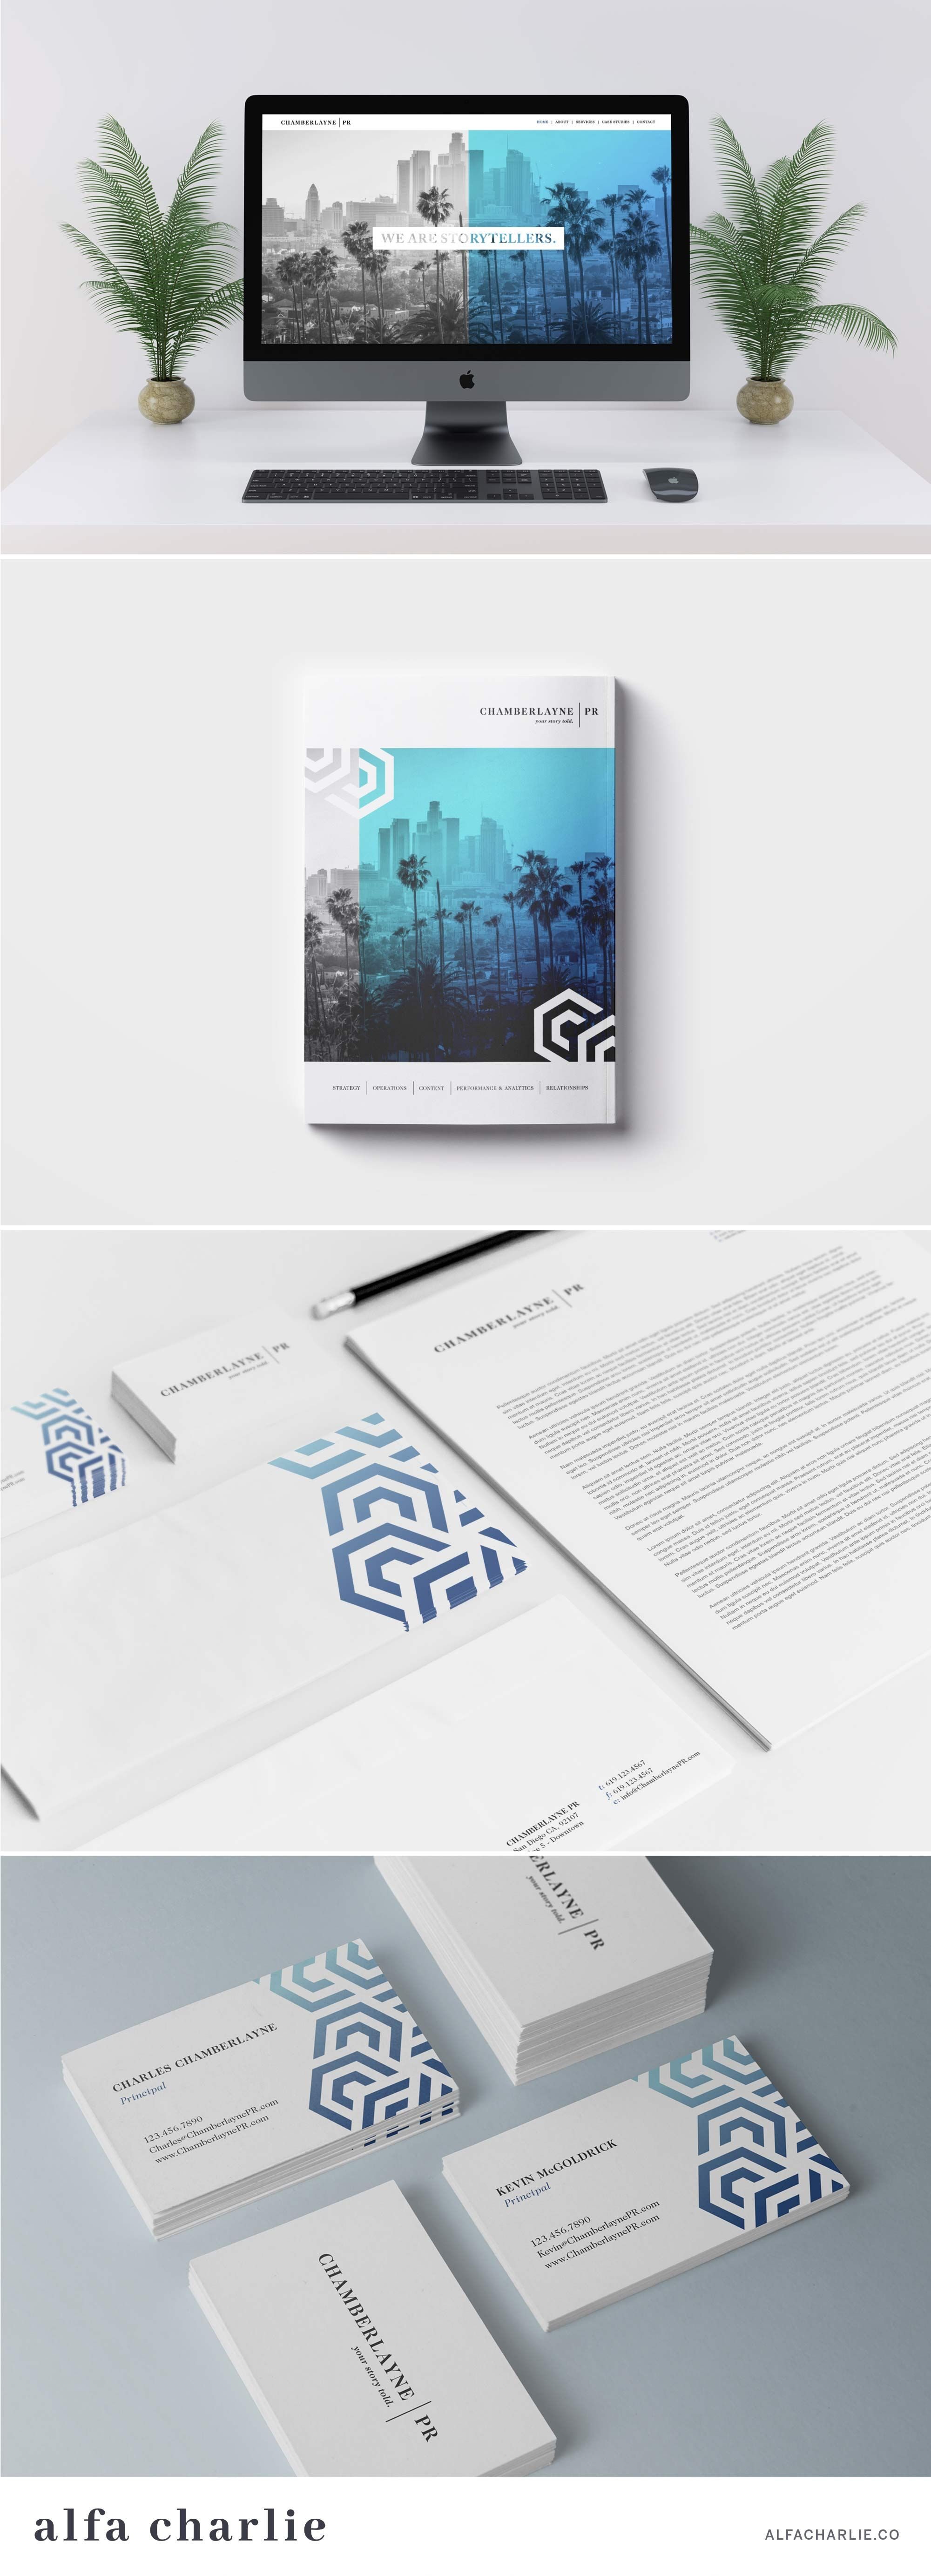 Logo Branding Web Design By Alfa Charlie Branding Design Inspiration Graphic Design Branding Marketing Business Card